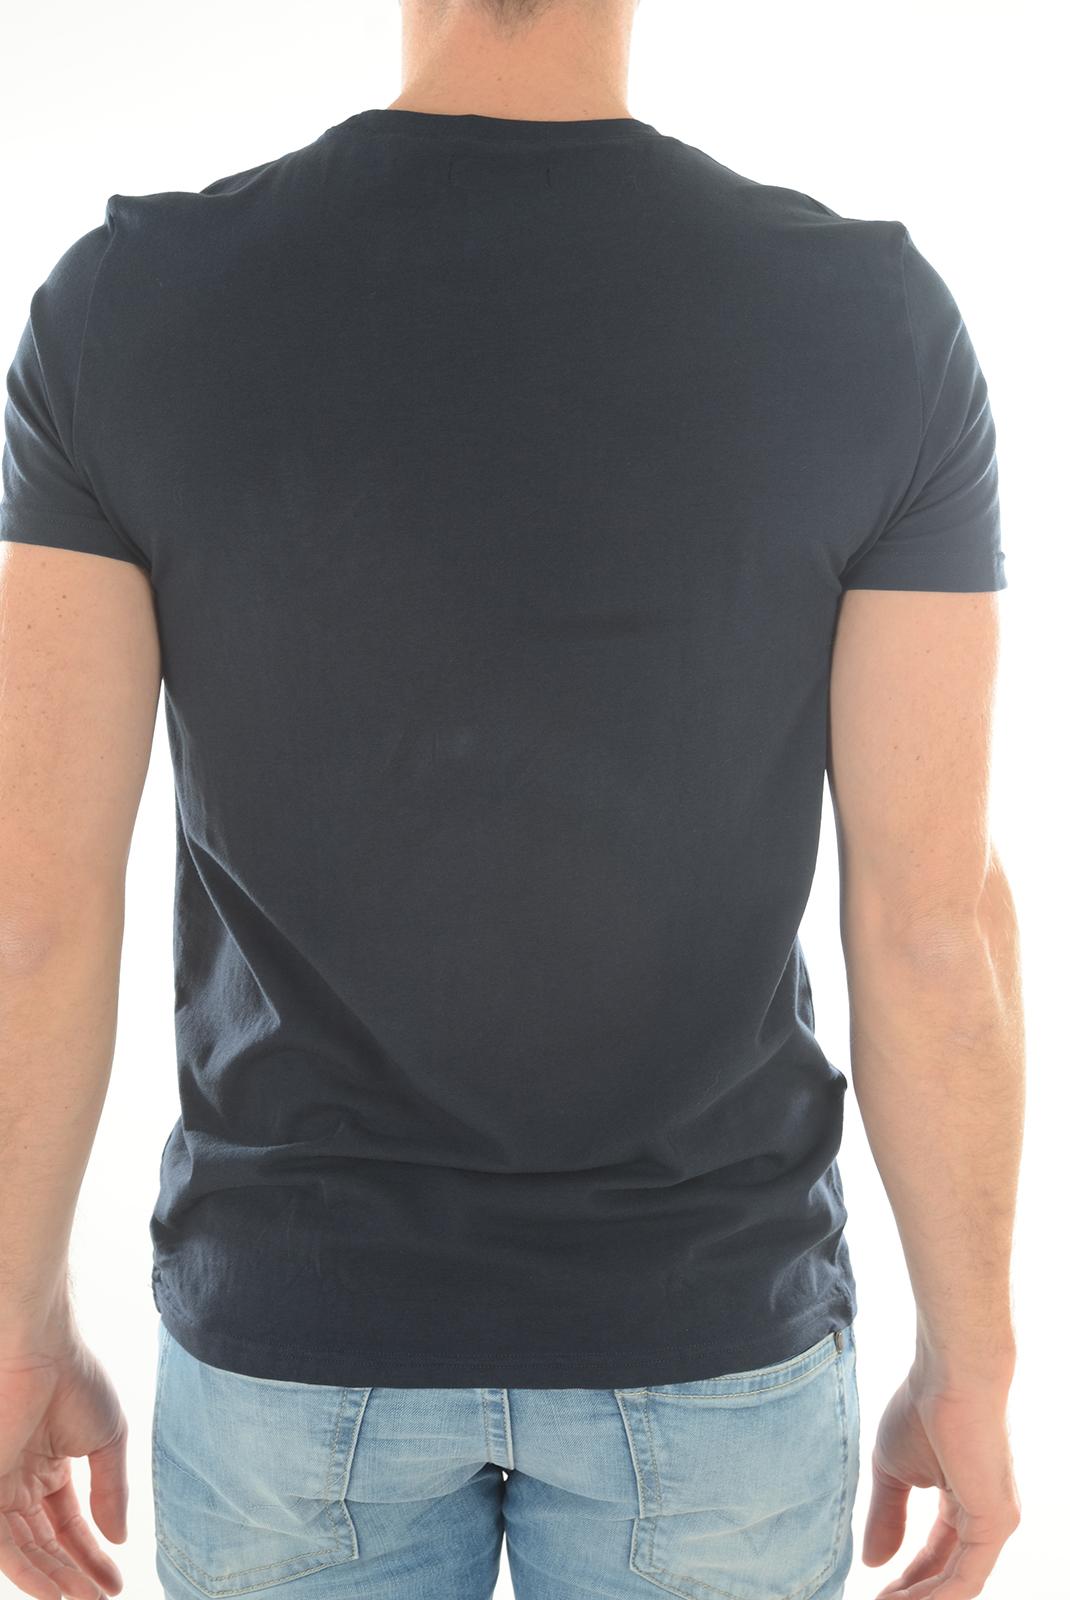 Tee-shirts manches courtes  Emporio armani 110853 6P510 135